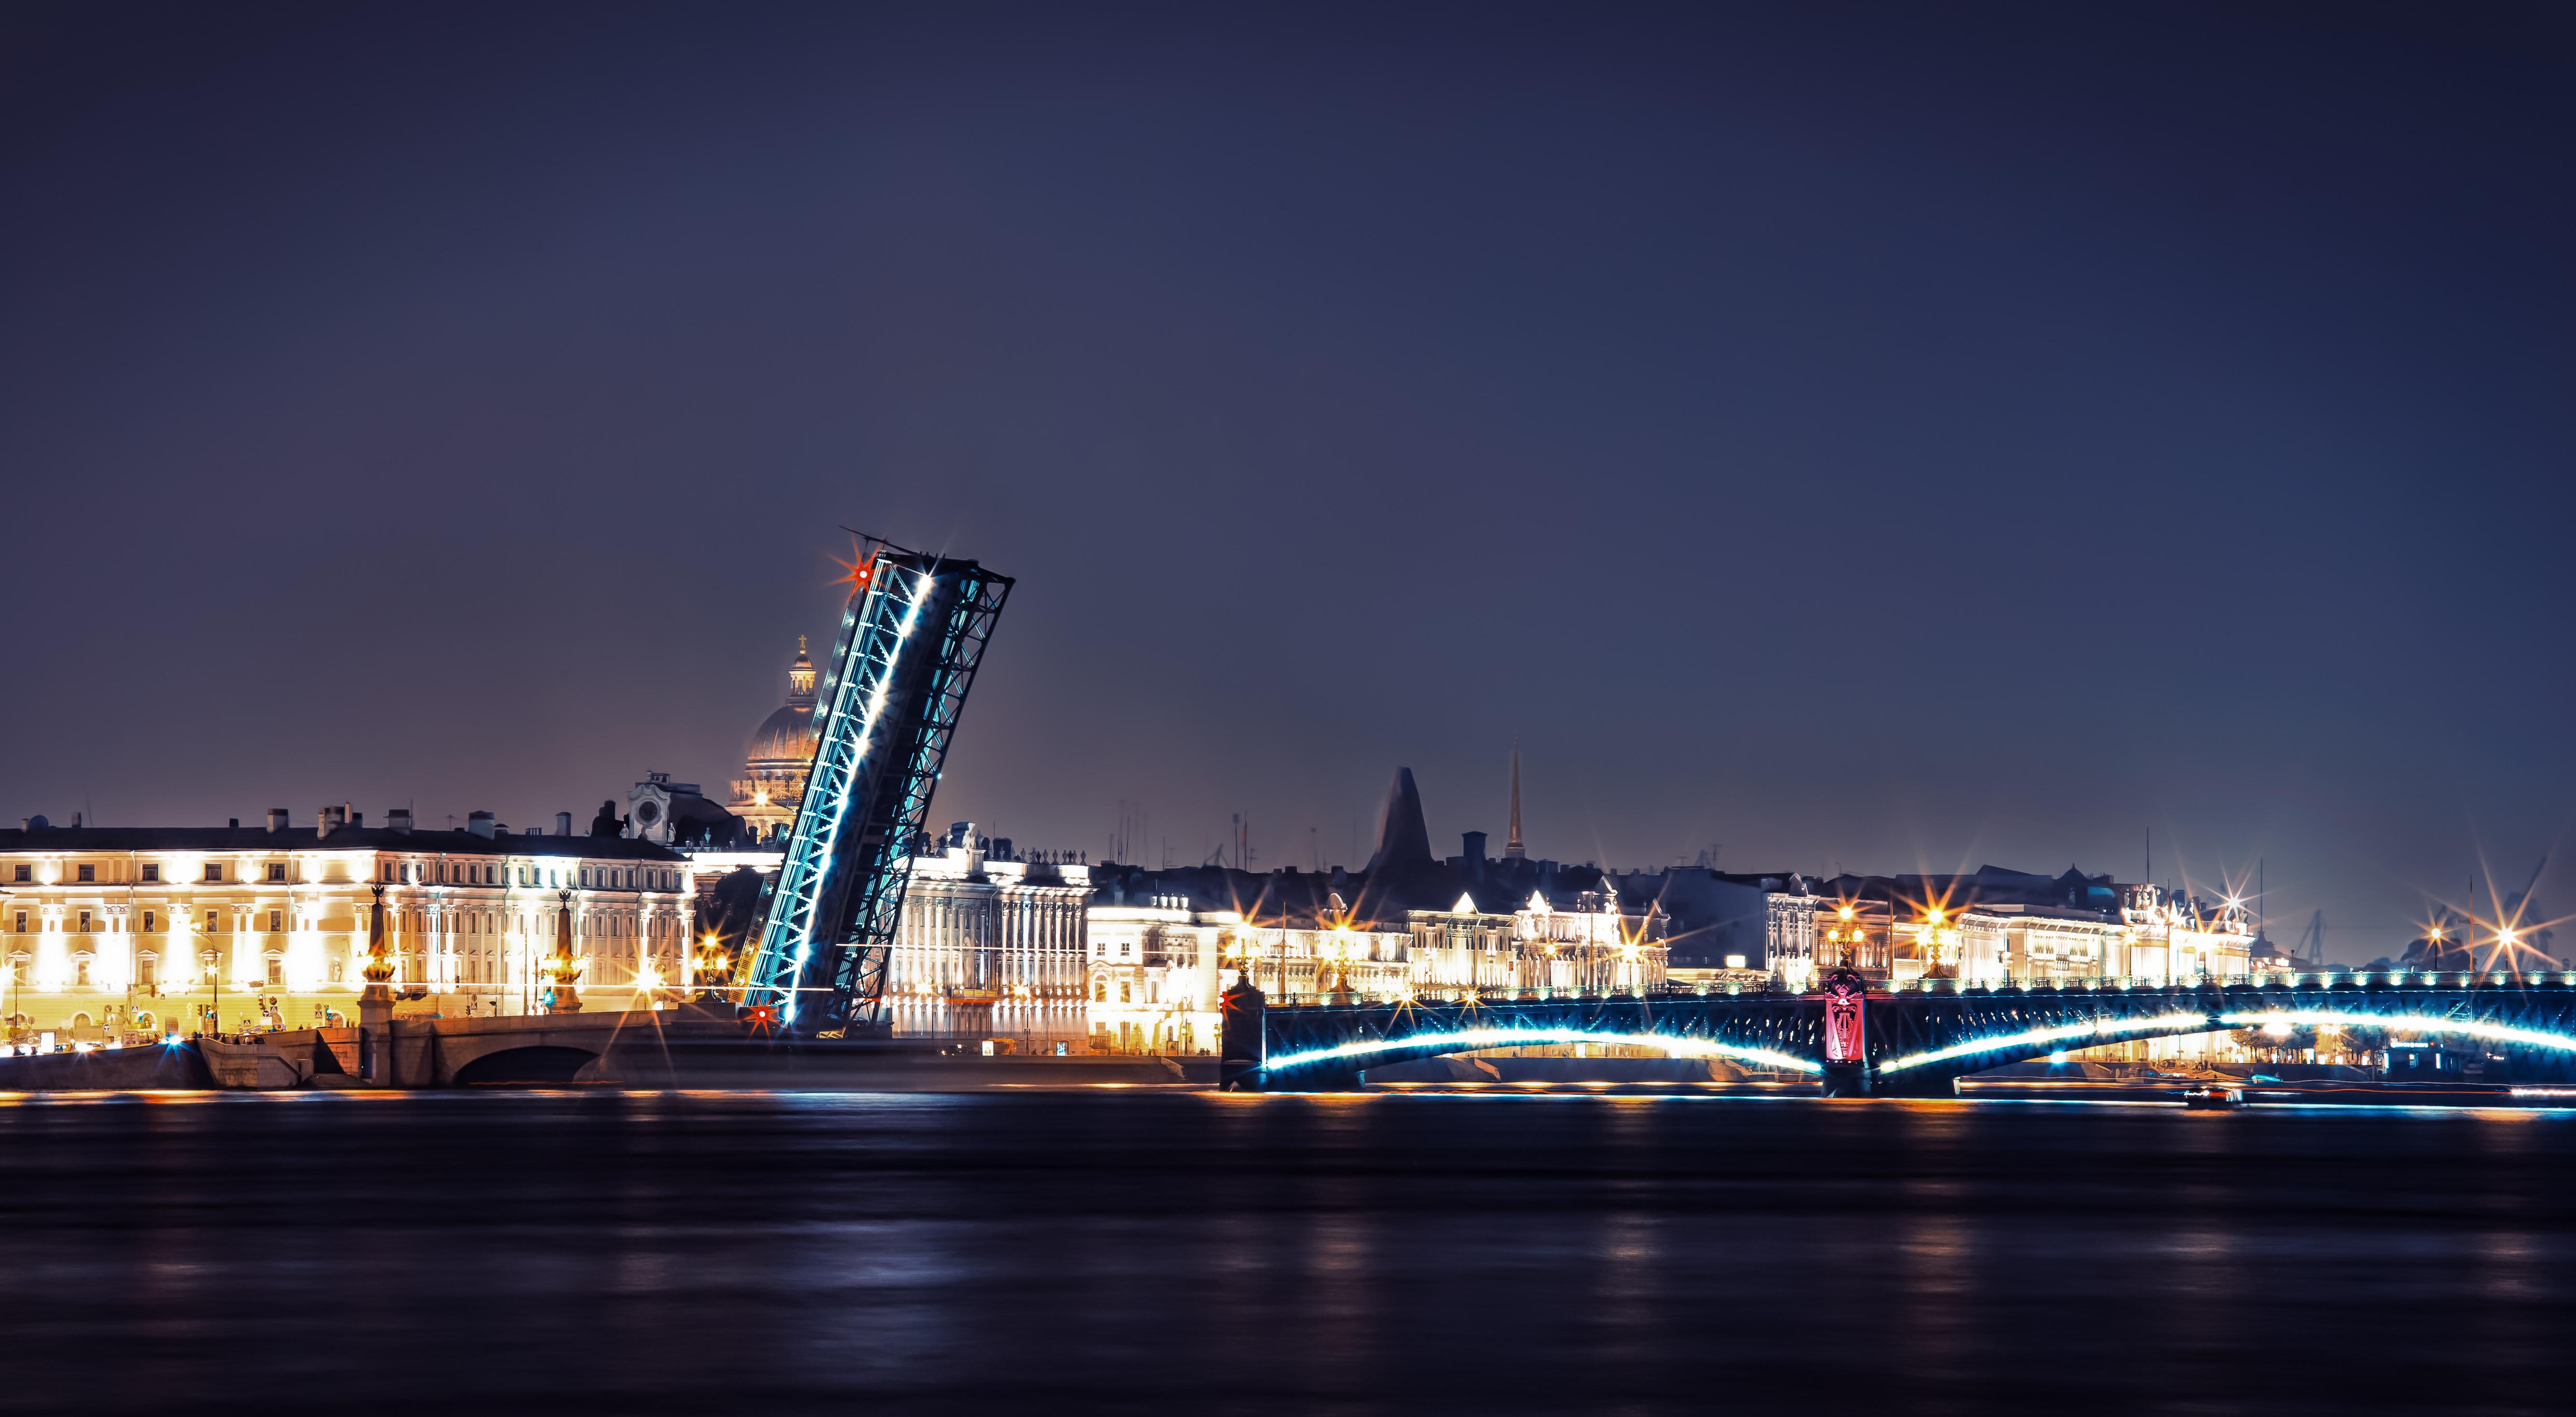 Man Made Saint Petersburg 5333x2934